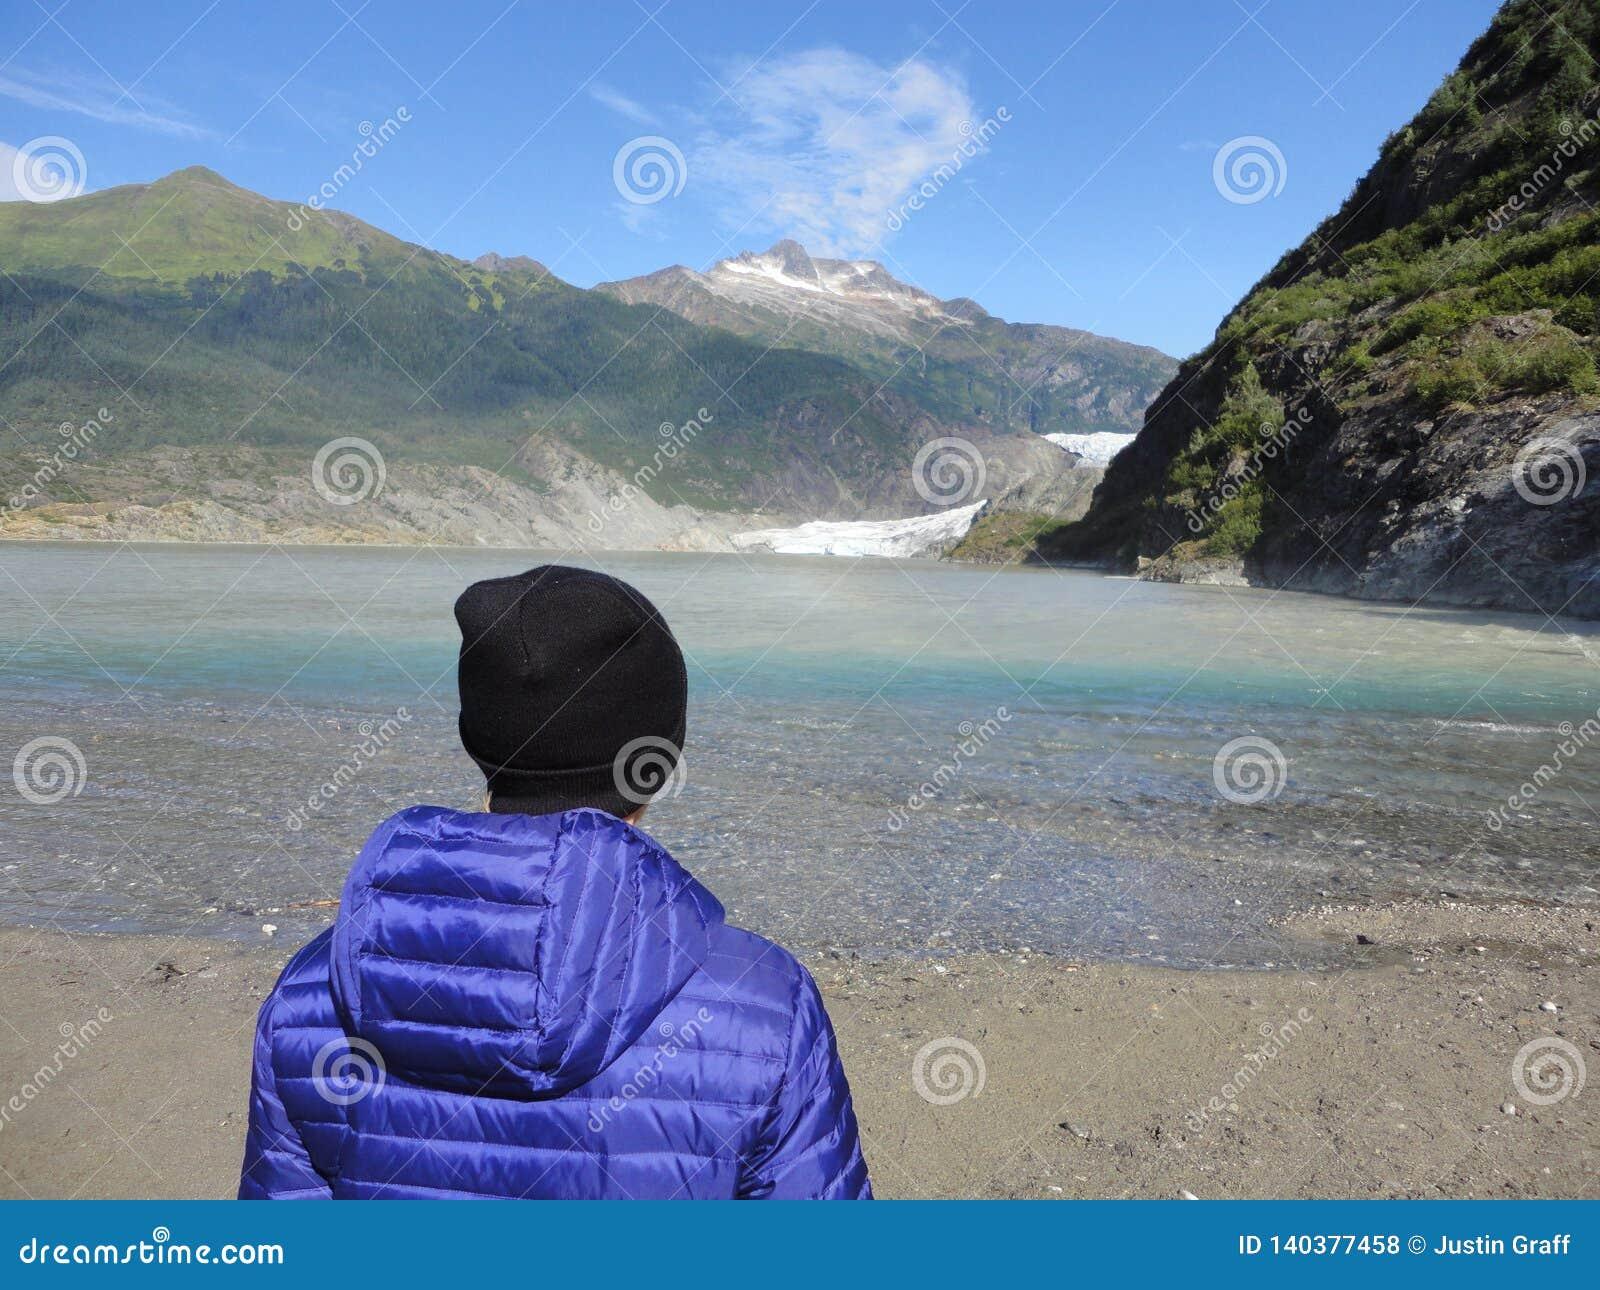 Mendenhall Glacier Juneau Alaska. Mendenhall Glacier flowing into Mendenhall Lake in between mountains with Nugget falls. Perfect